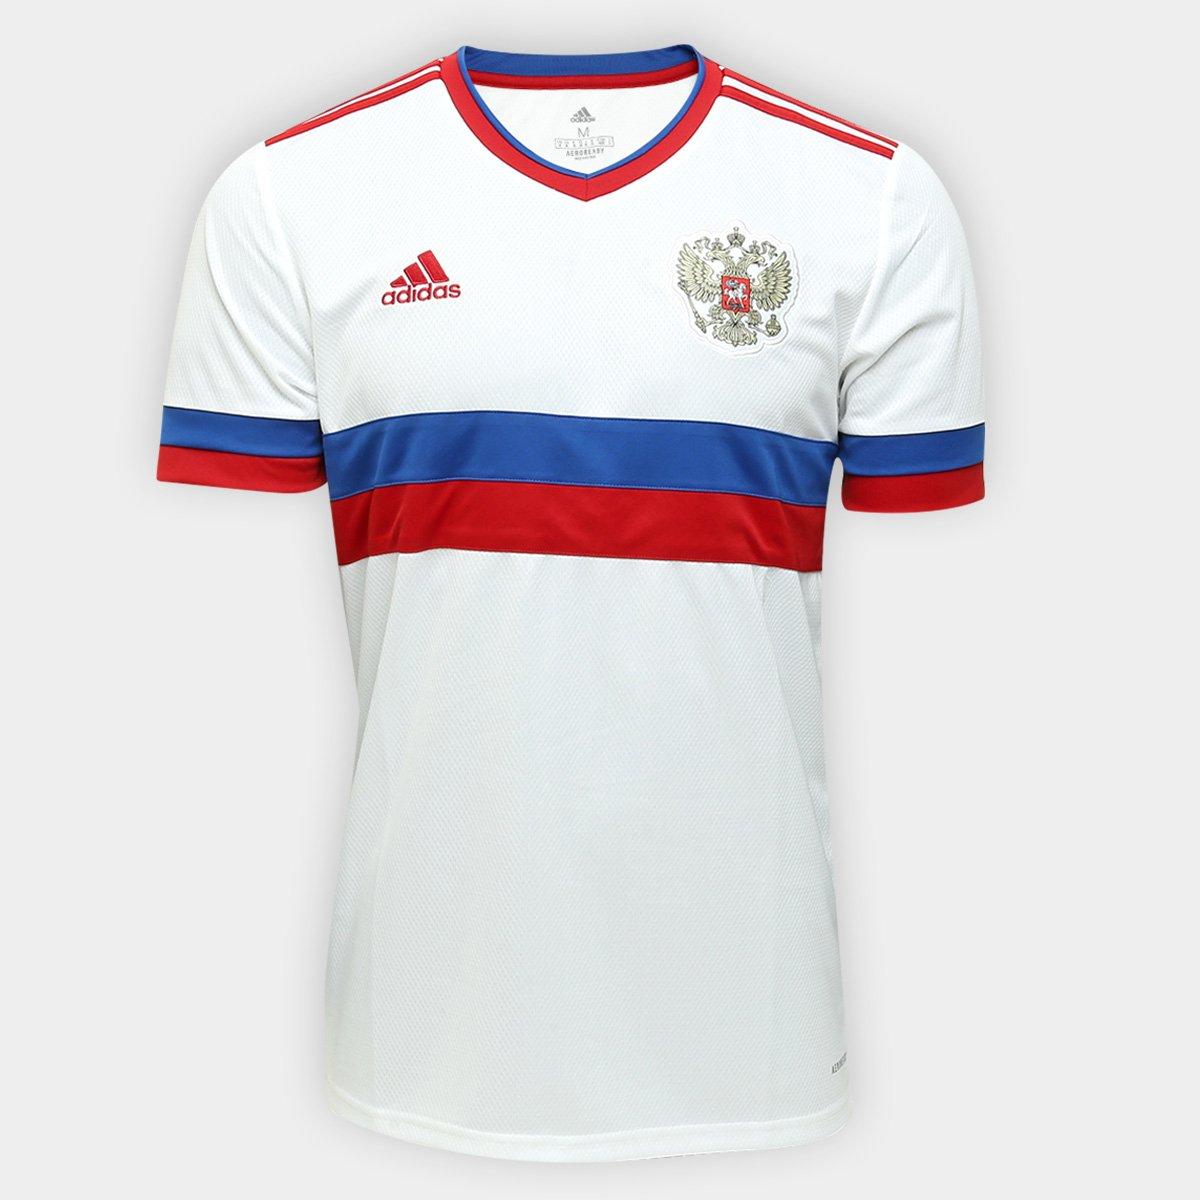 Camisa Seleção Rússia Away 20/21 s/n° Torcedor Adidas Masculina